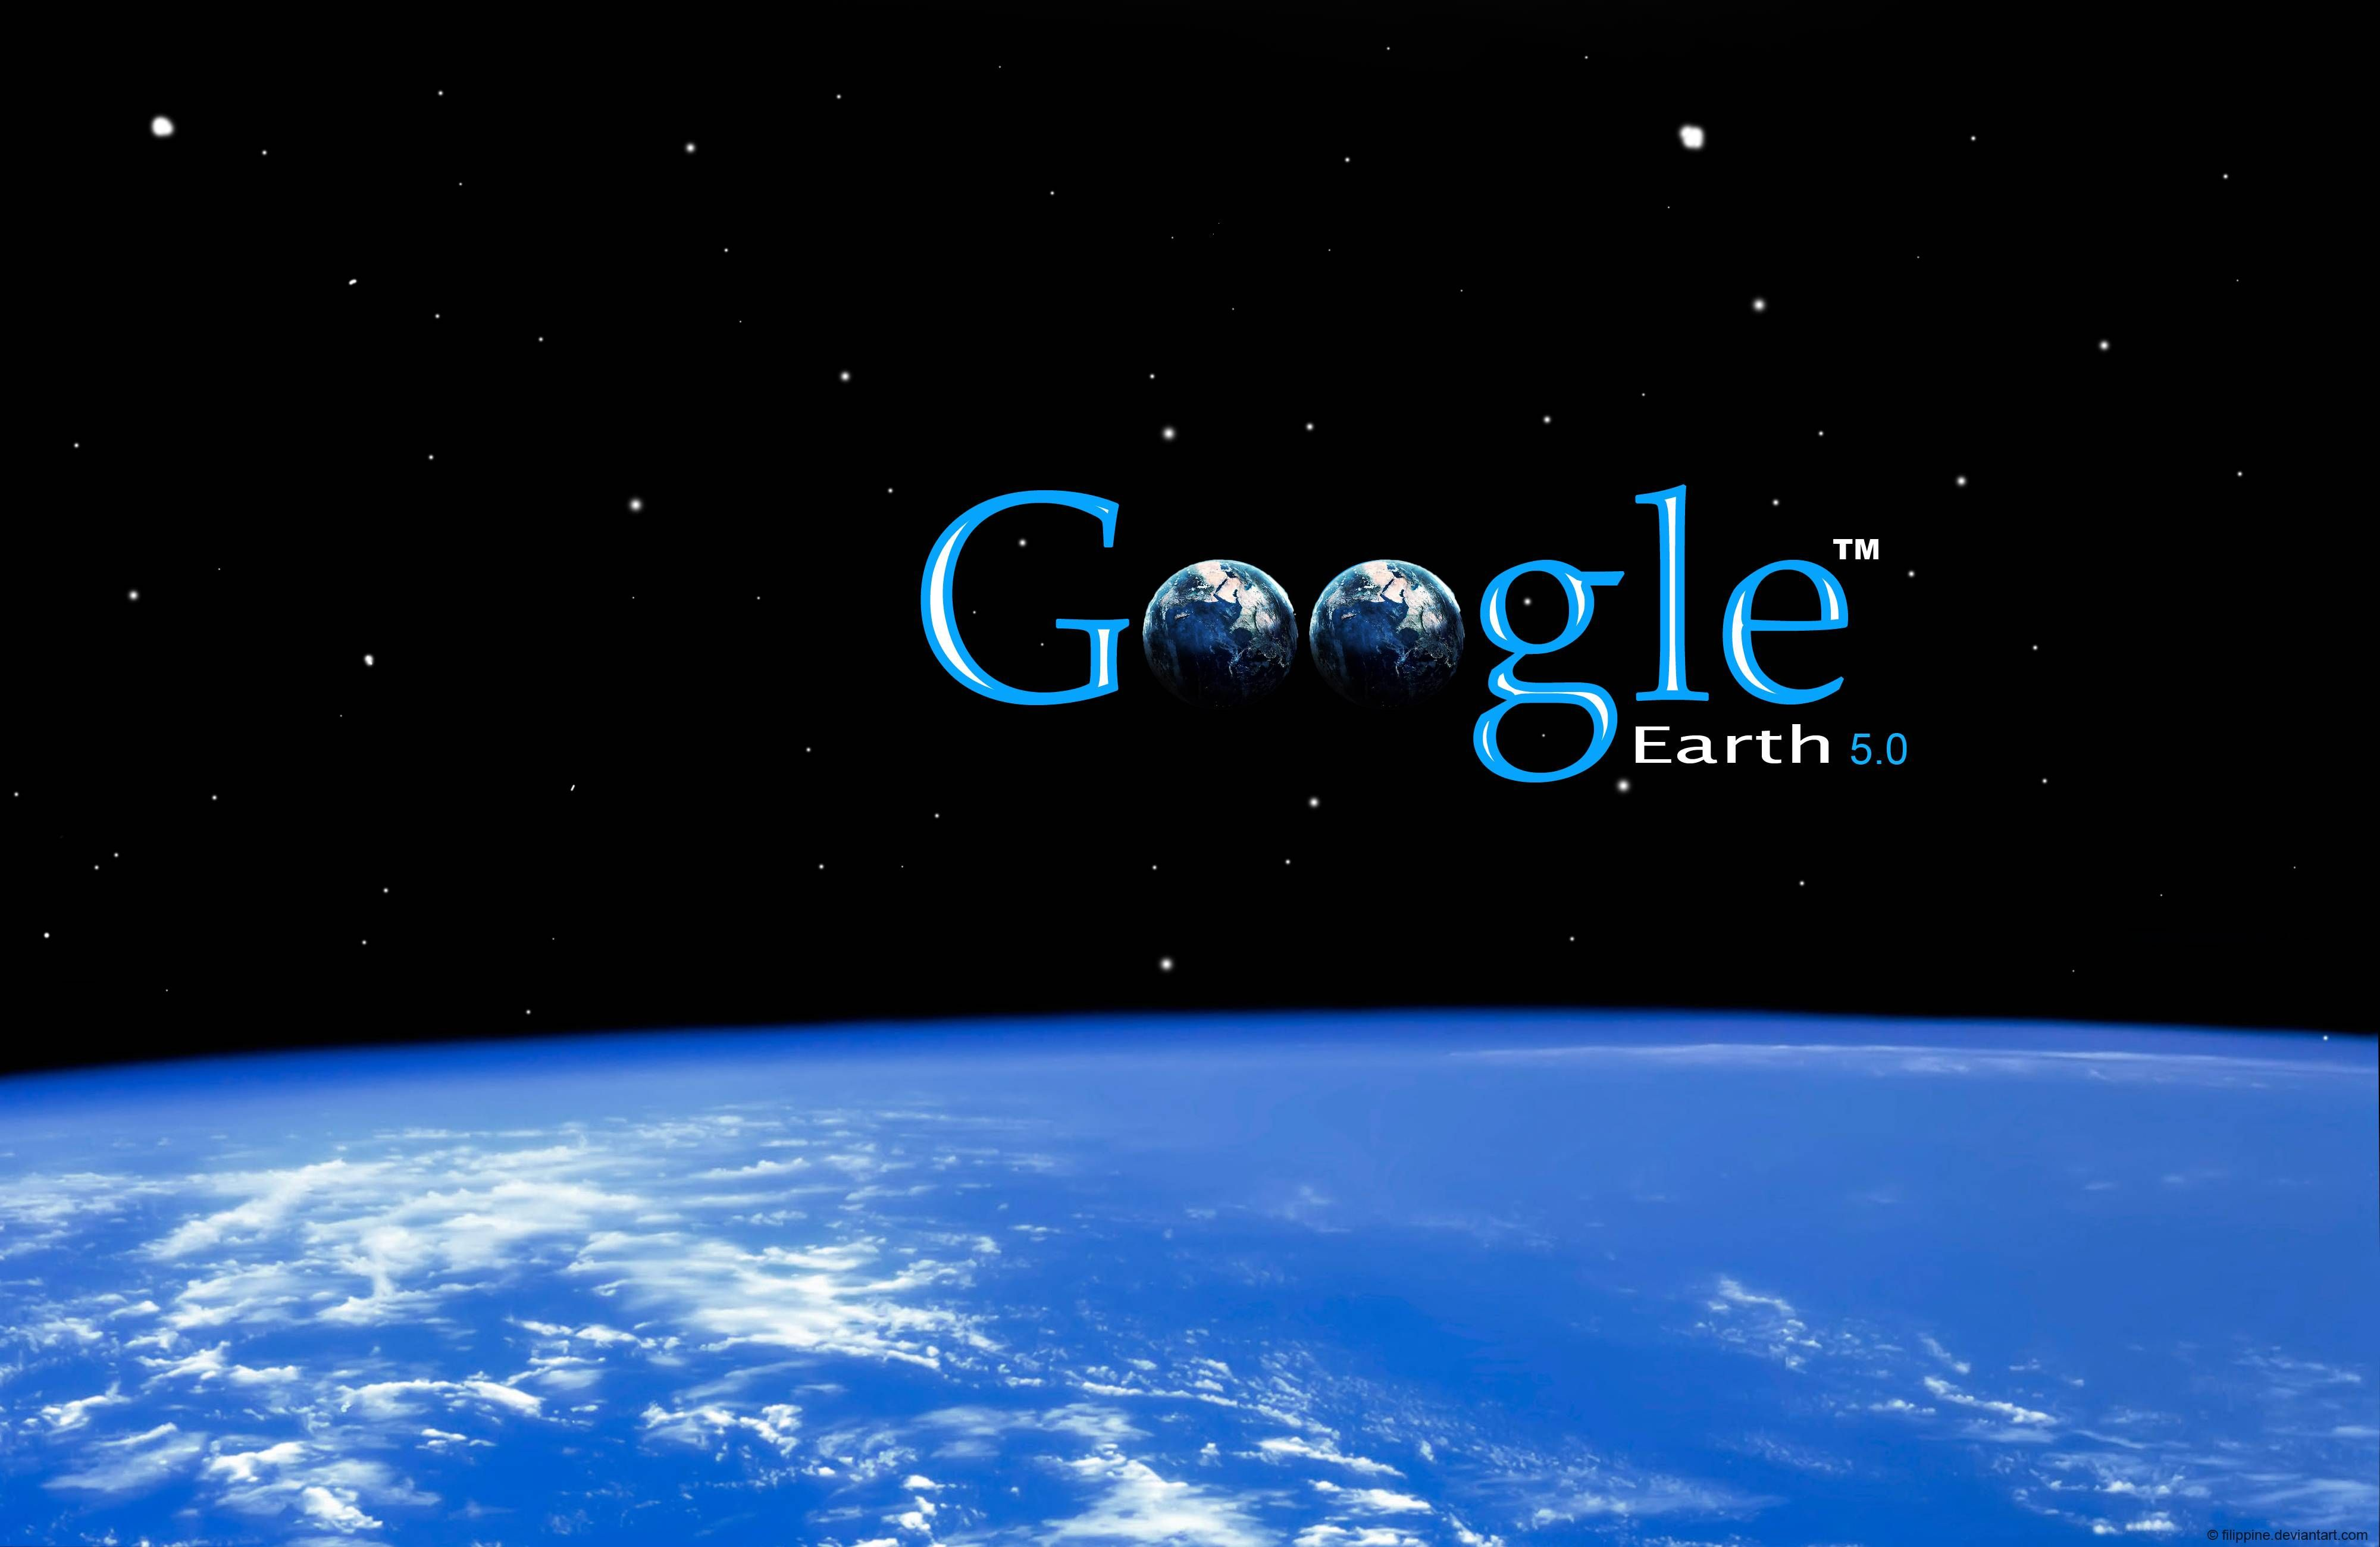 Pretty Nice HD Google Wallpaper Check More At Dougleschan The Recruitment Guru Hd